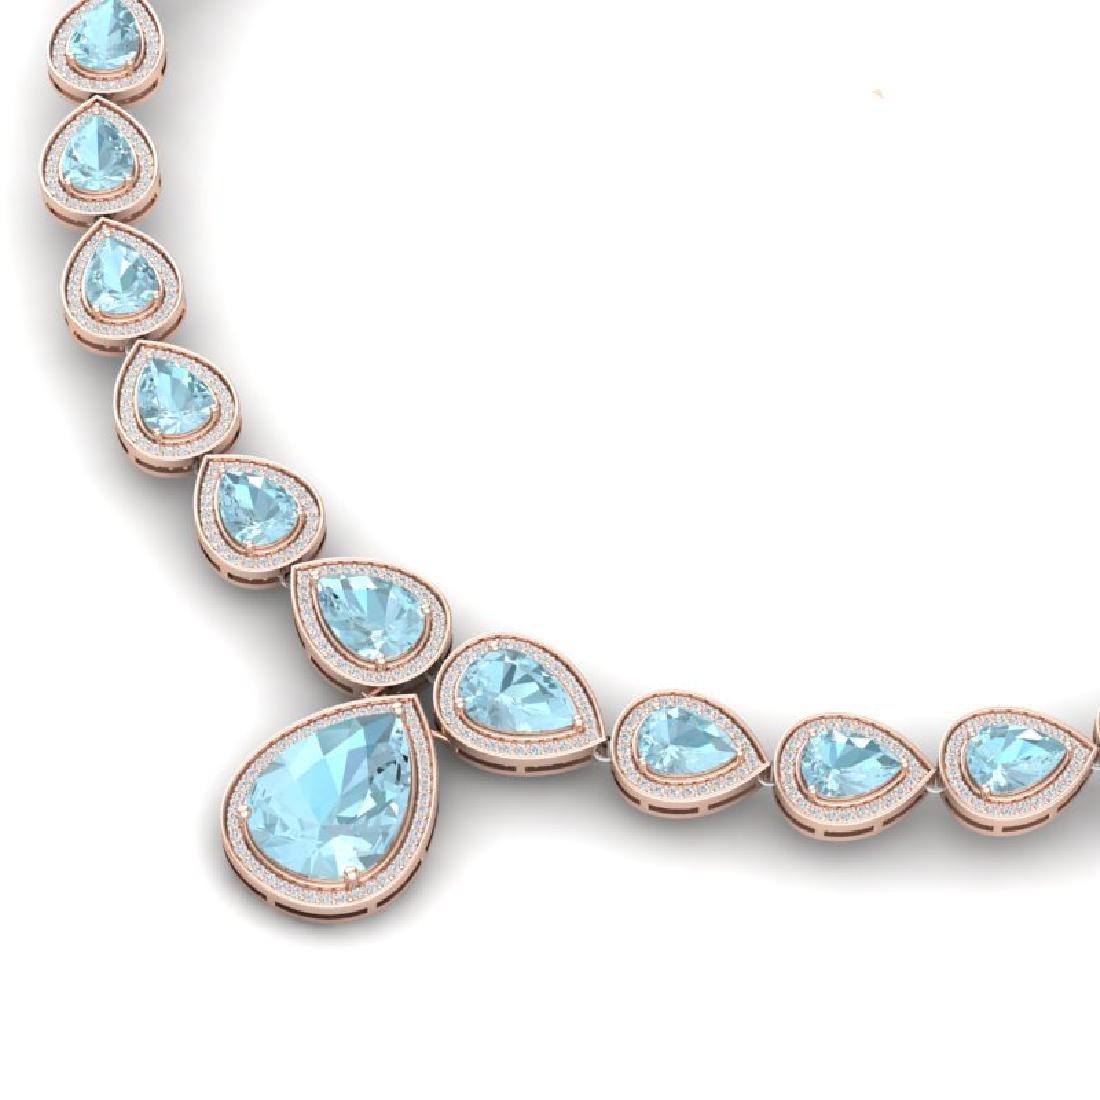 54 CTW Royalty Sky Topaz & VS Diamond Necklace 18K Rose - 2